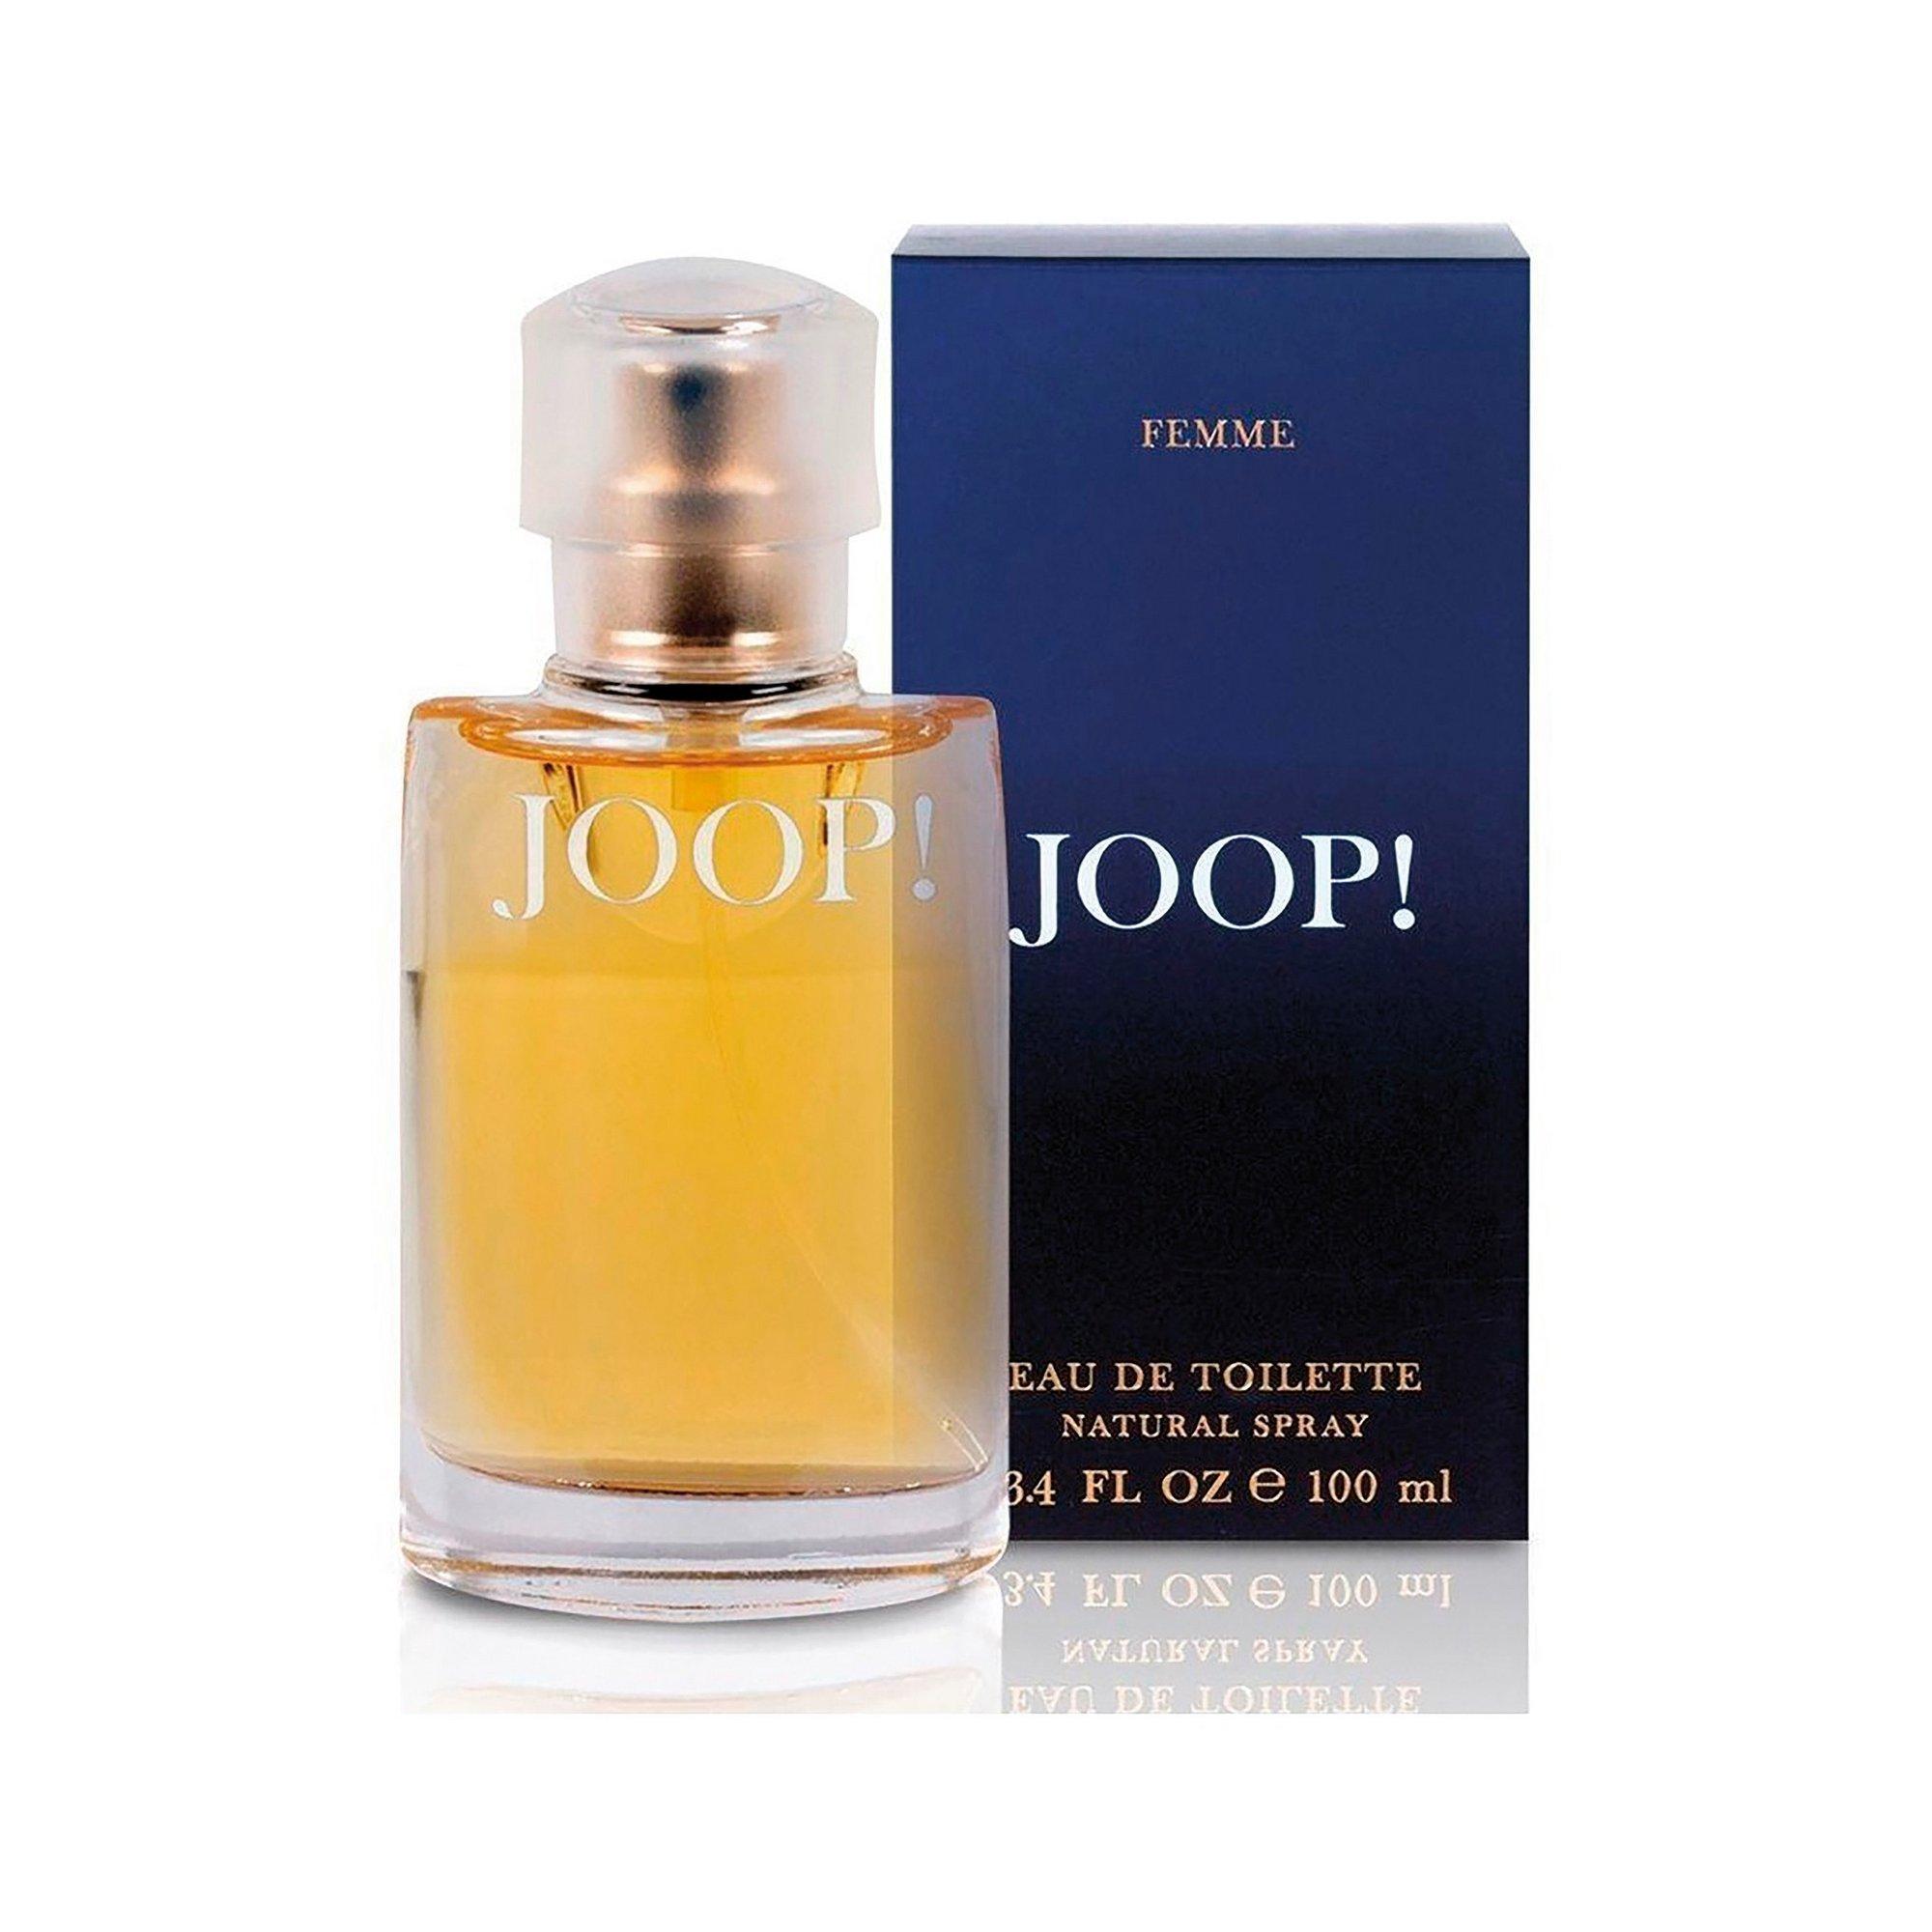 Image of Joop! Femme 100ml EDT